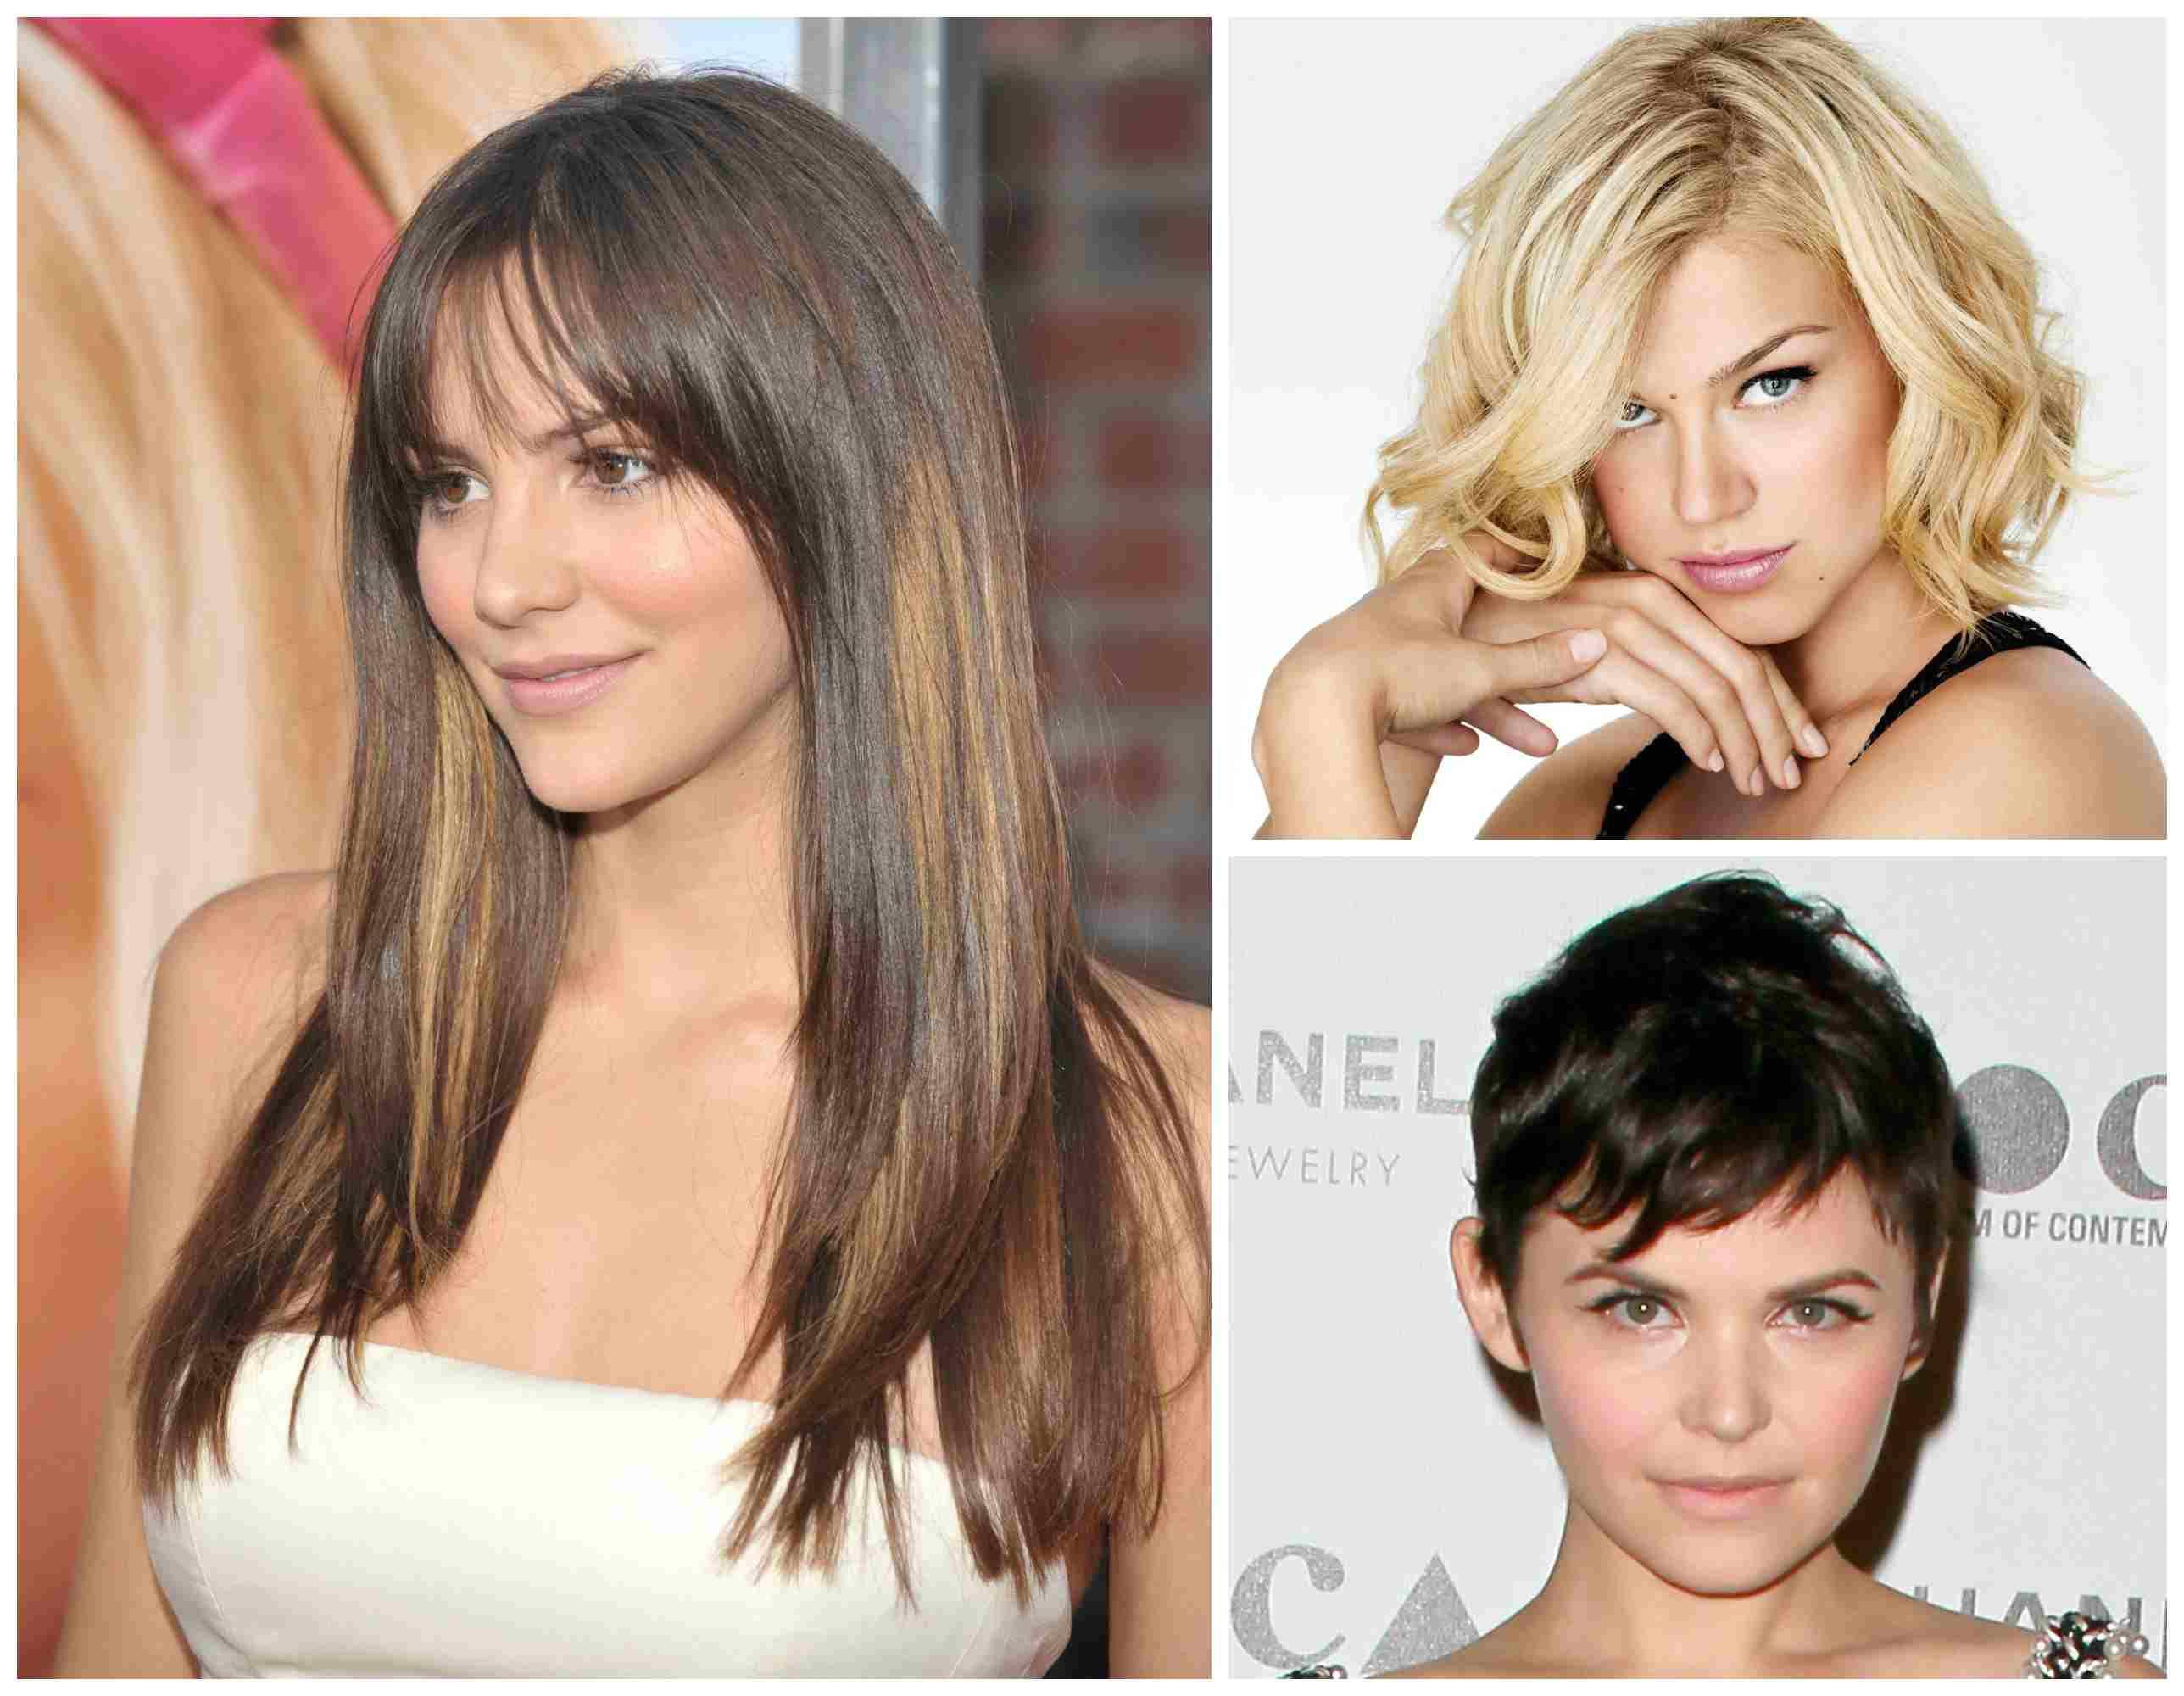 hairstyles by face shape 56a f9b58eba4b158b4